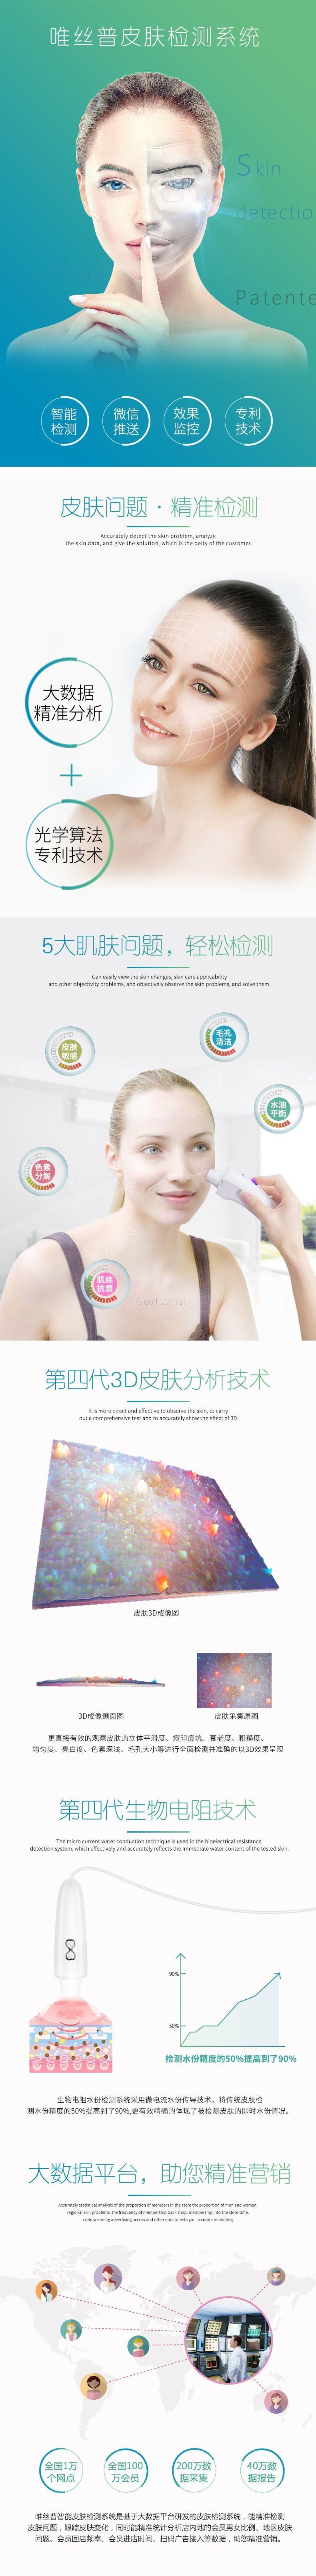 WAX-PF012唯丝普全脸肌肤检测系统